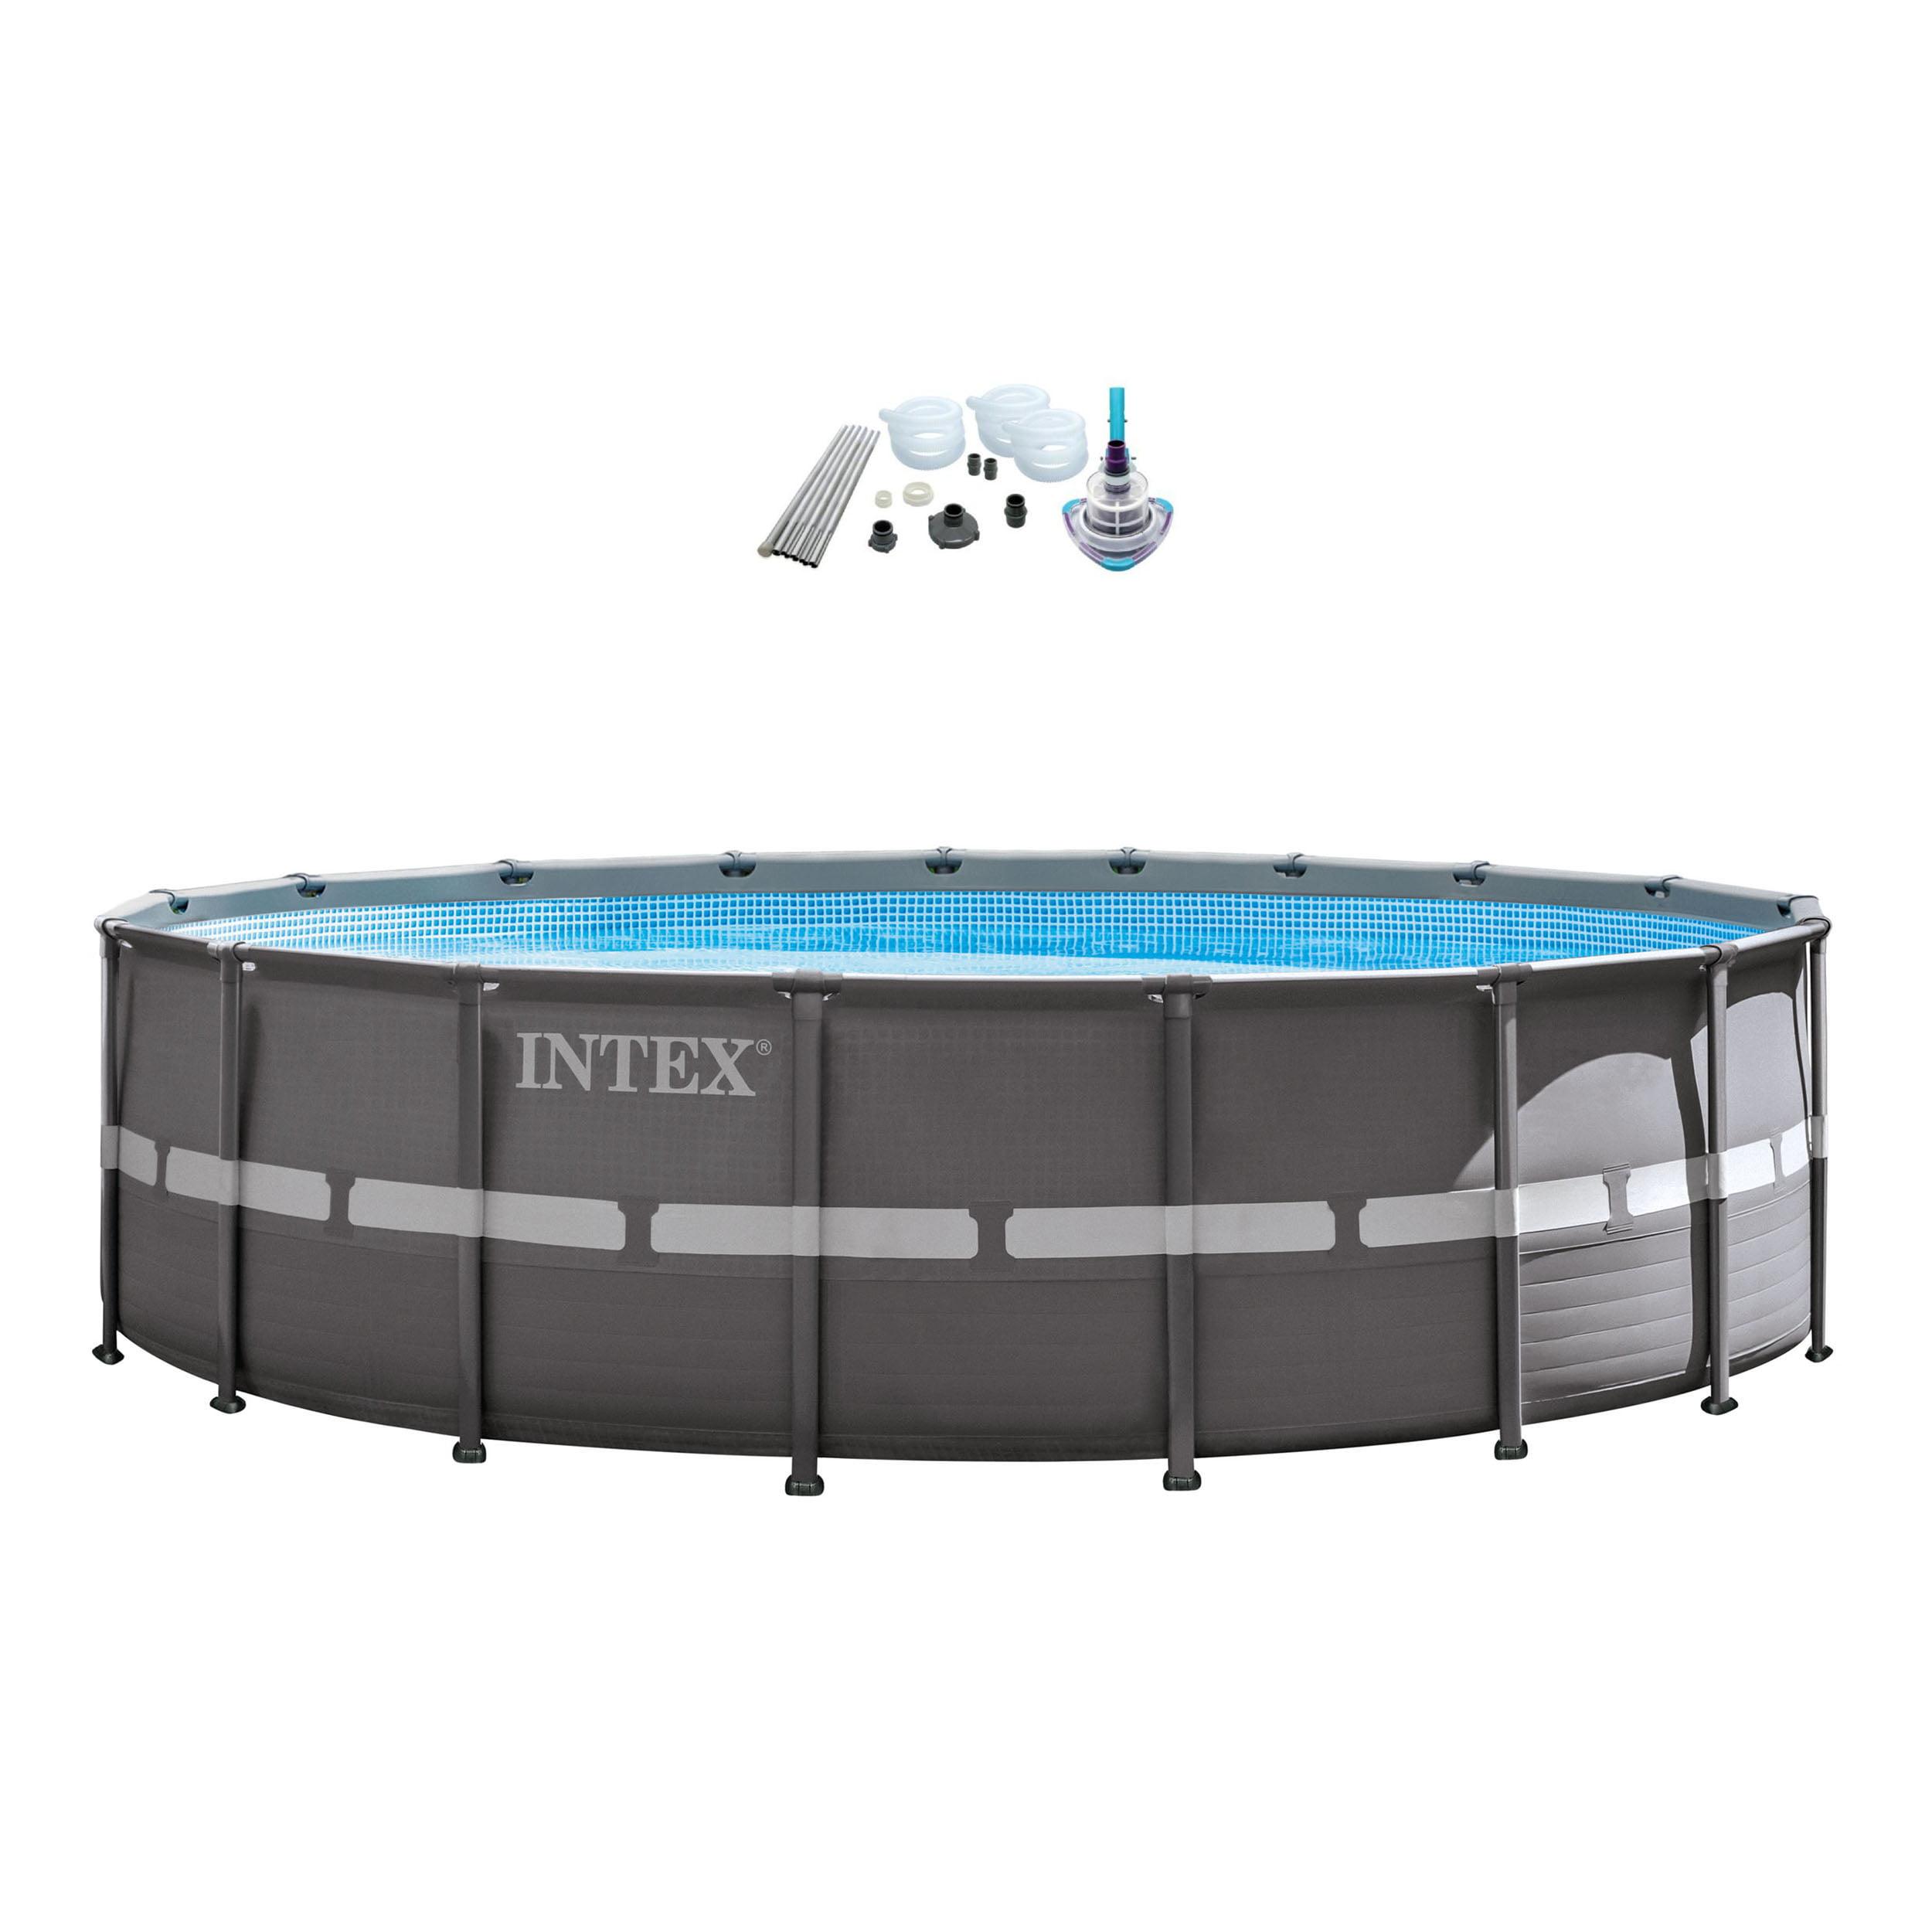 "Intex 18' x 52"" Ultra Frame Pool Set with 2100 GPH Sand Filter Pump & V-Trap Vac"